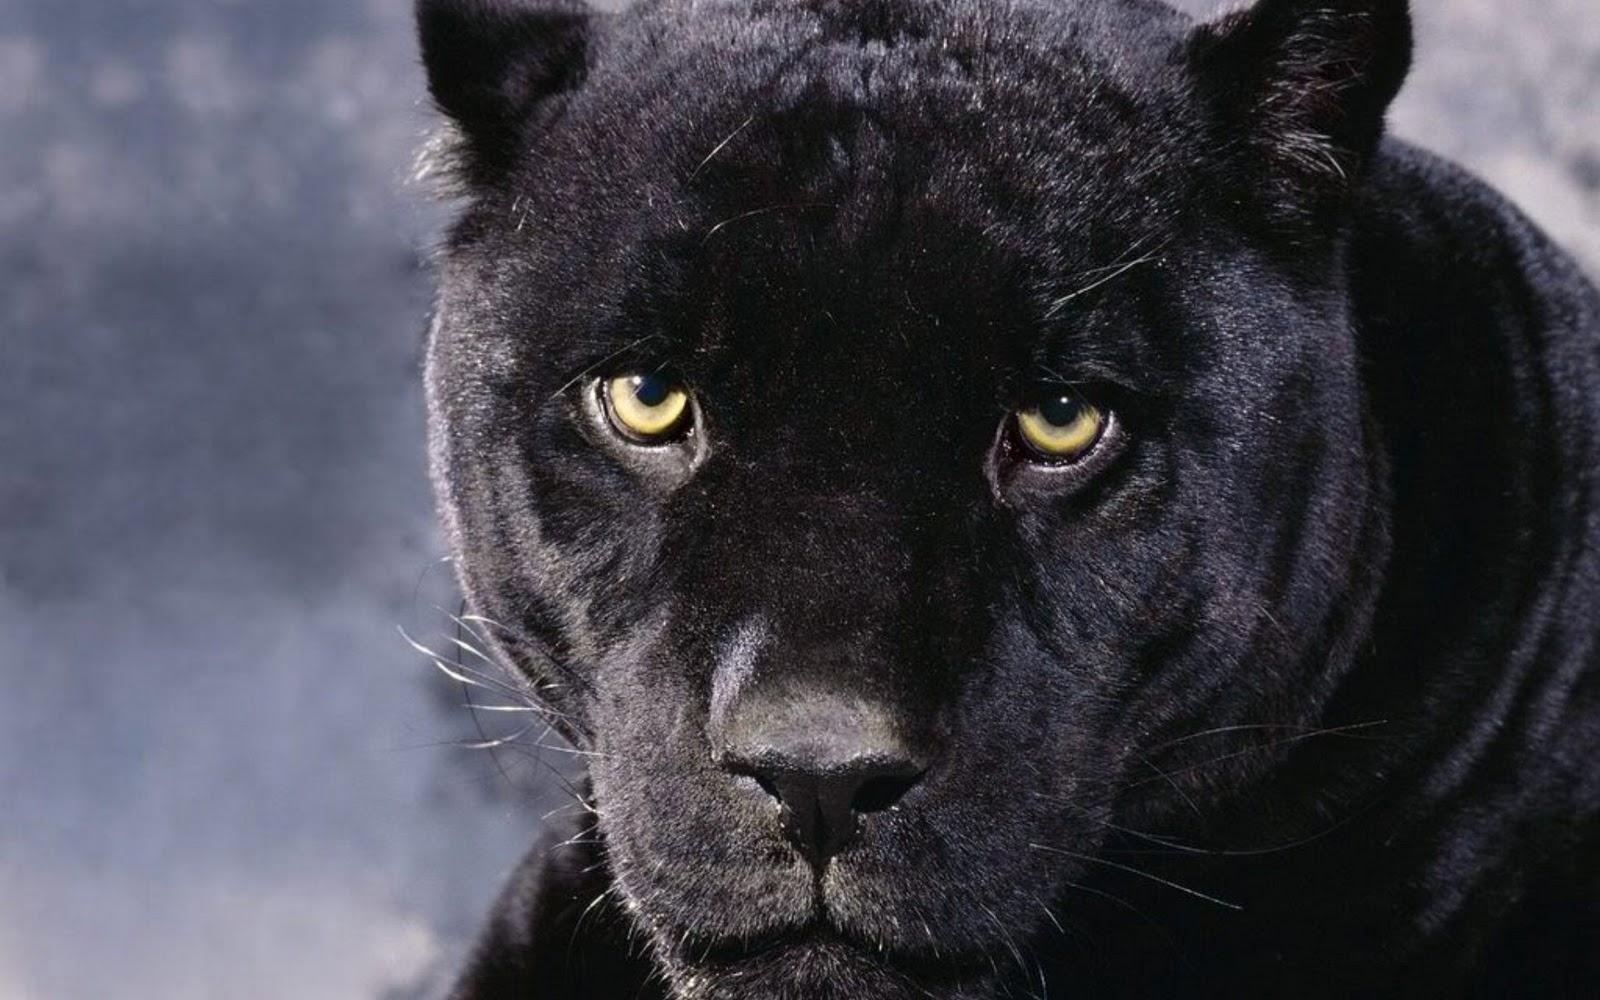 http://3.bp.blogspot.com/-kYiDTygHhyk/TZFQWJlZj7I/AAAAAAAABwI/MZvyiAAMB2k/s1600/Panther%20%2828%29.jpg